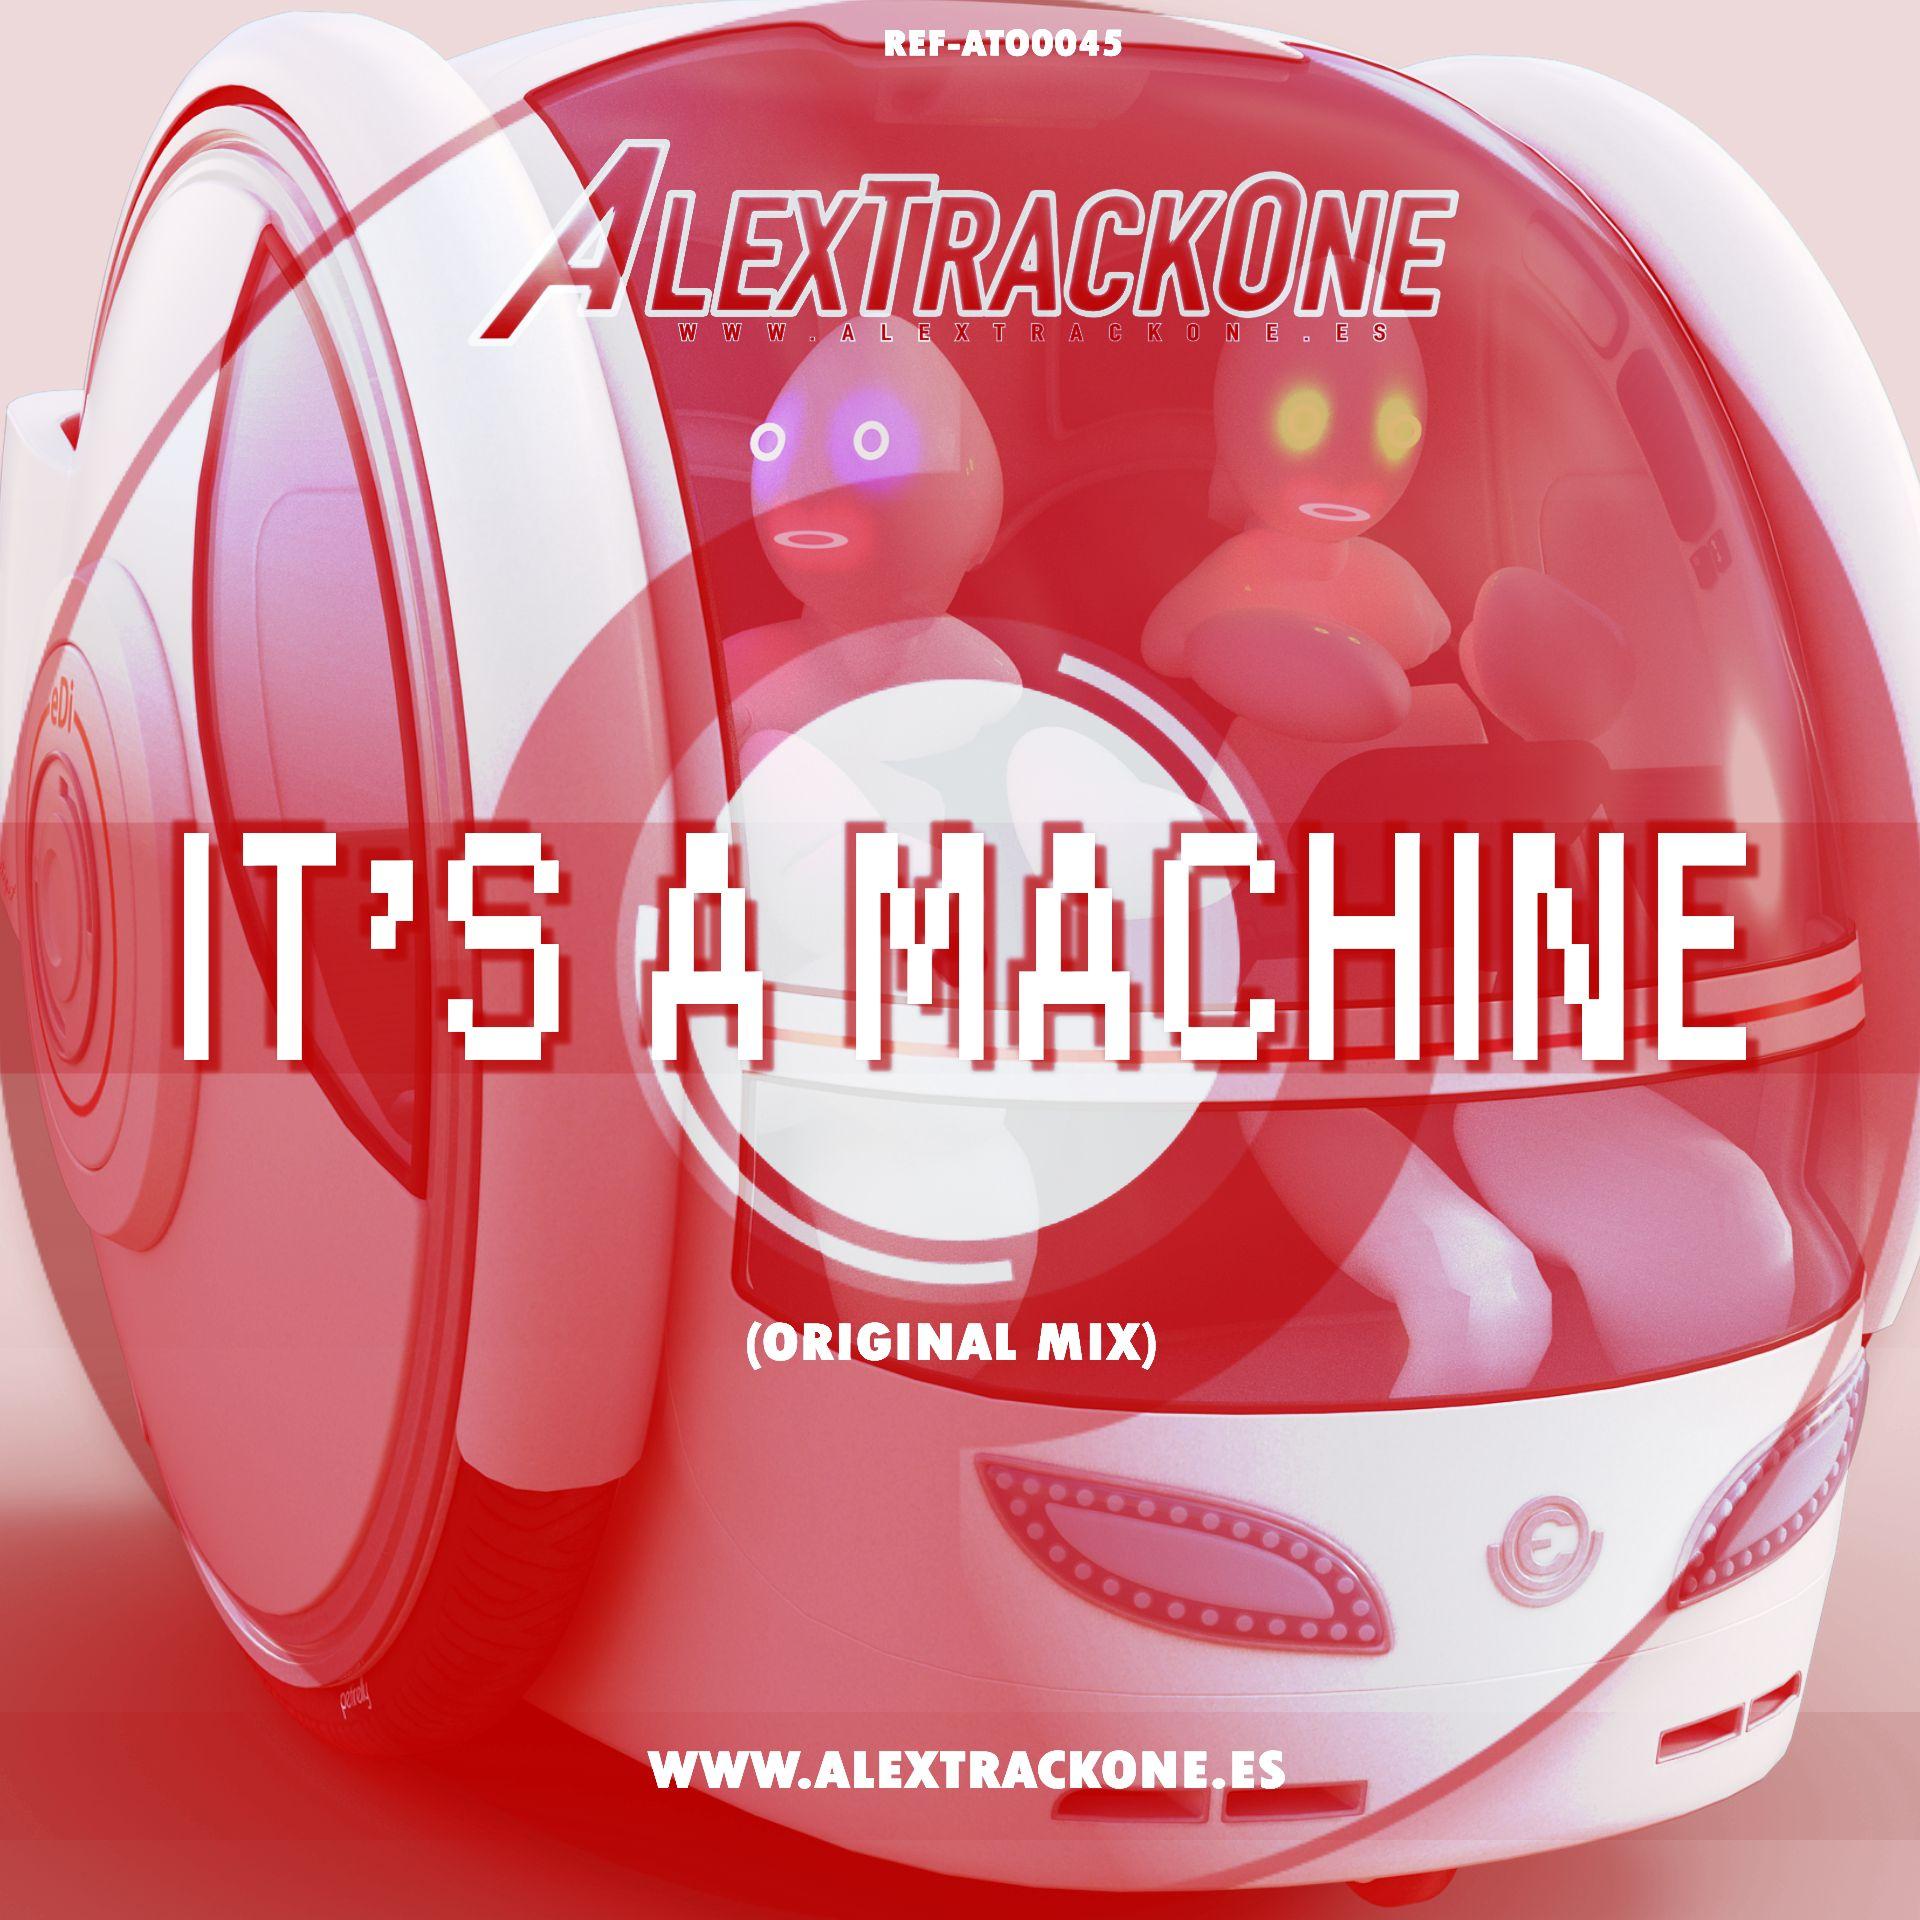 REF-ATO0045 ITS A MACHINE (ORIGINAL MIX) (MP3 & WAV)